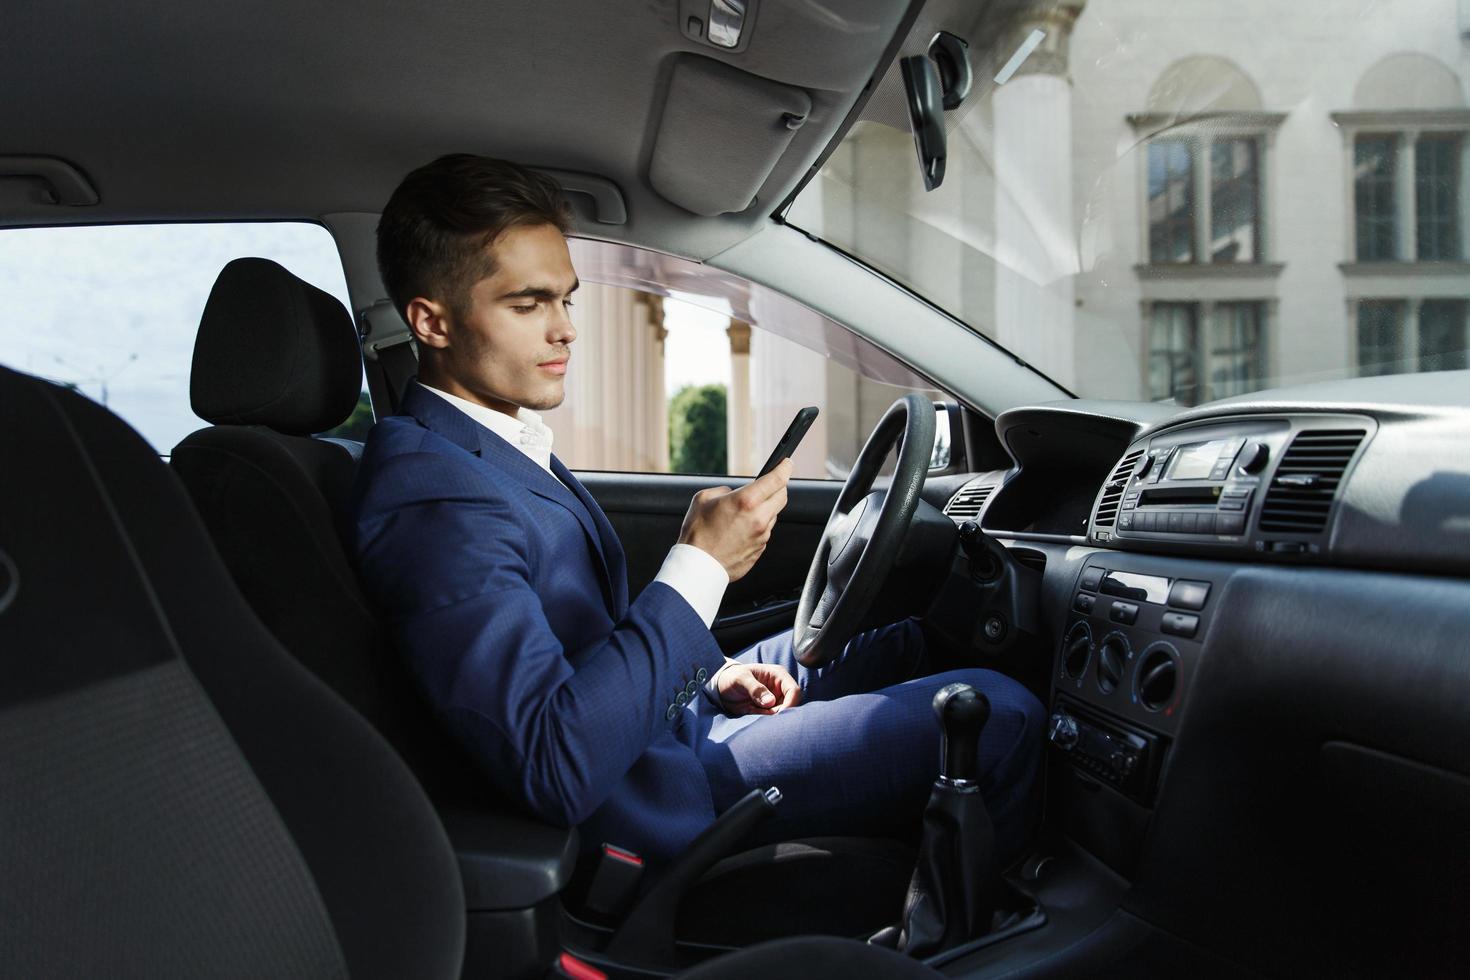 man som kontrollerar sin telefon i bilen foto